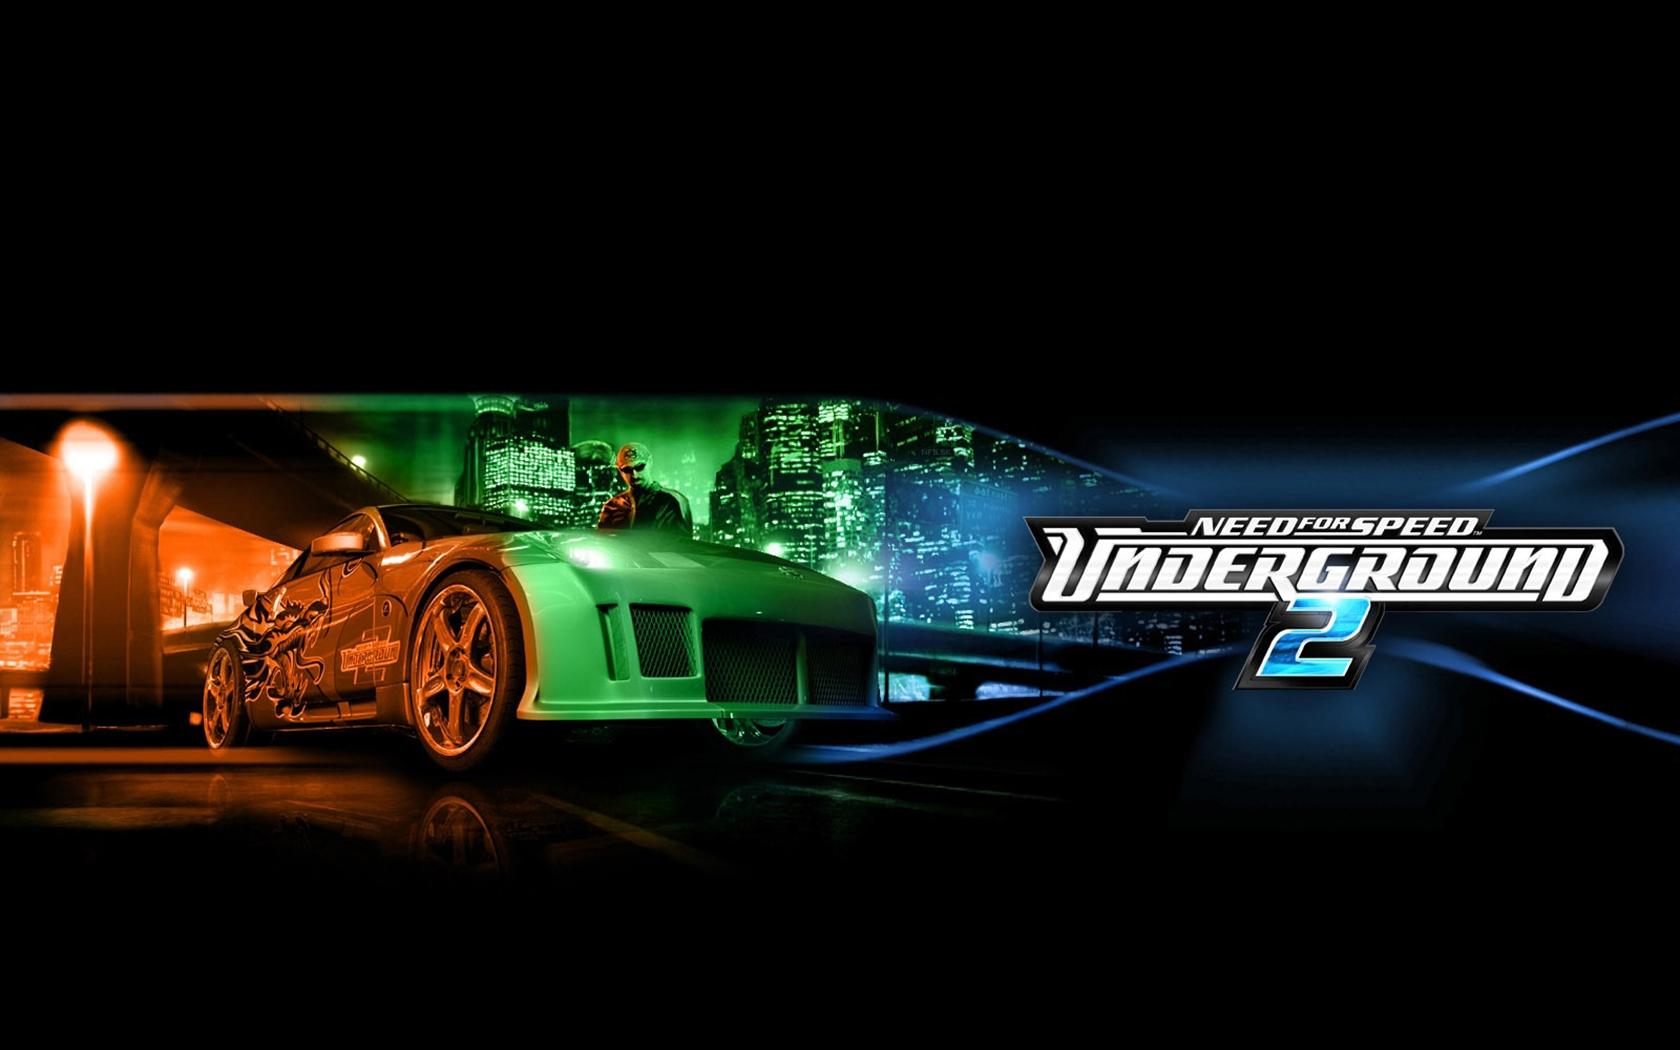 Wallpaper Need For Speed Underground 2 Nissan City Bridge